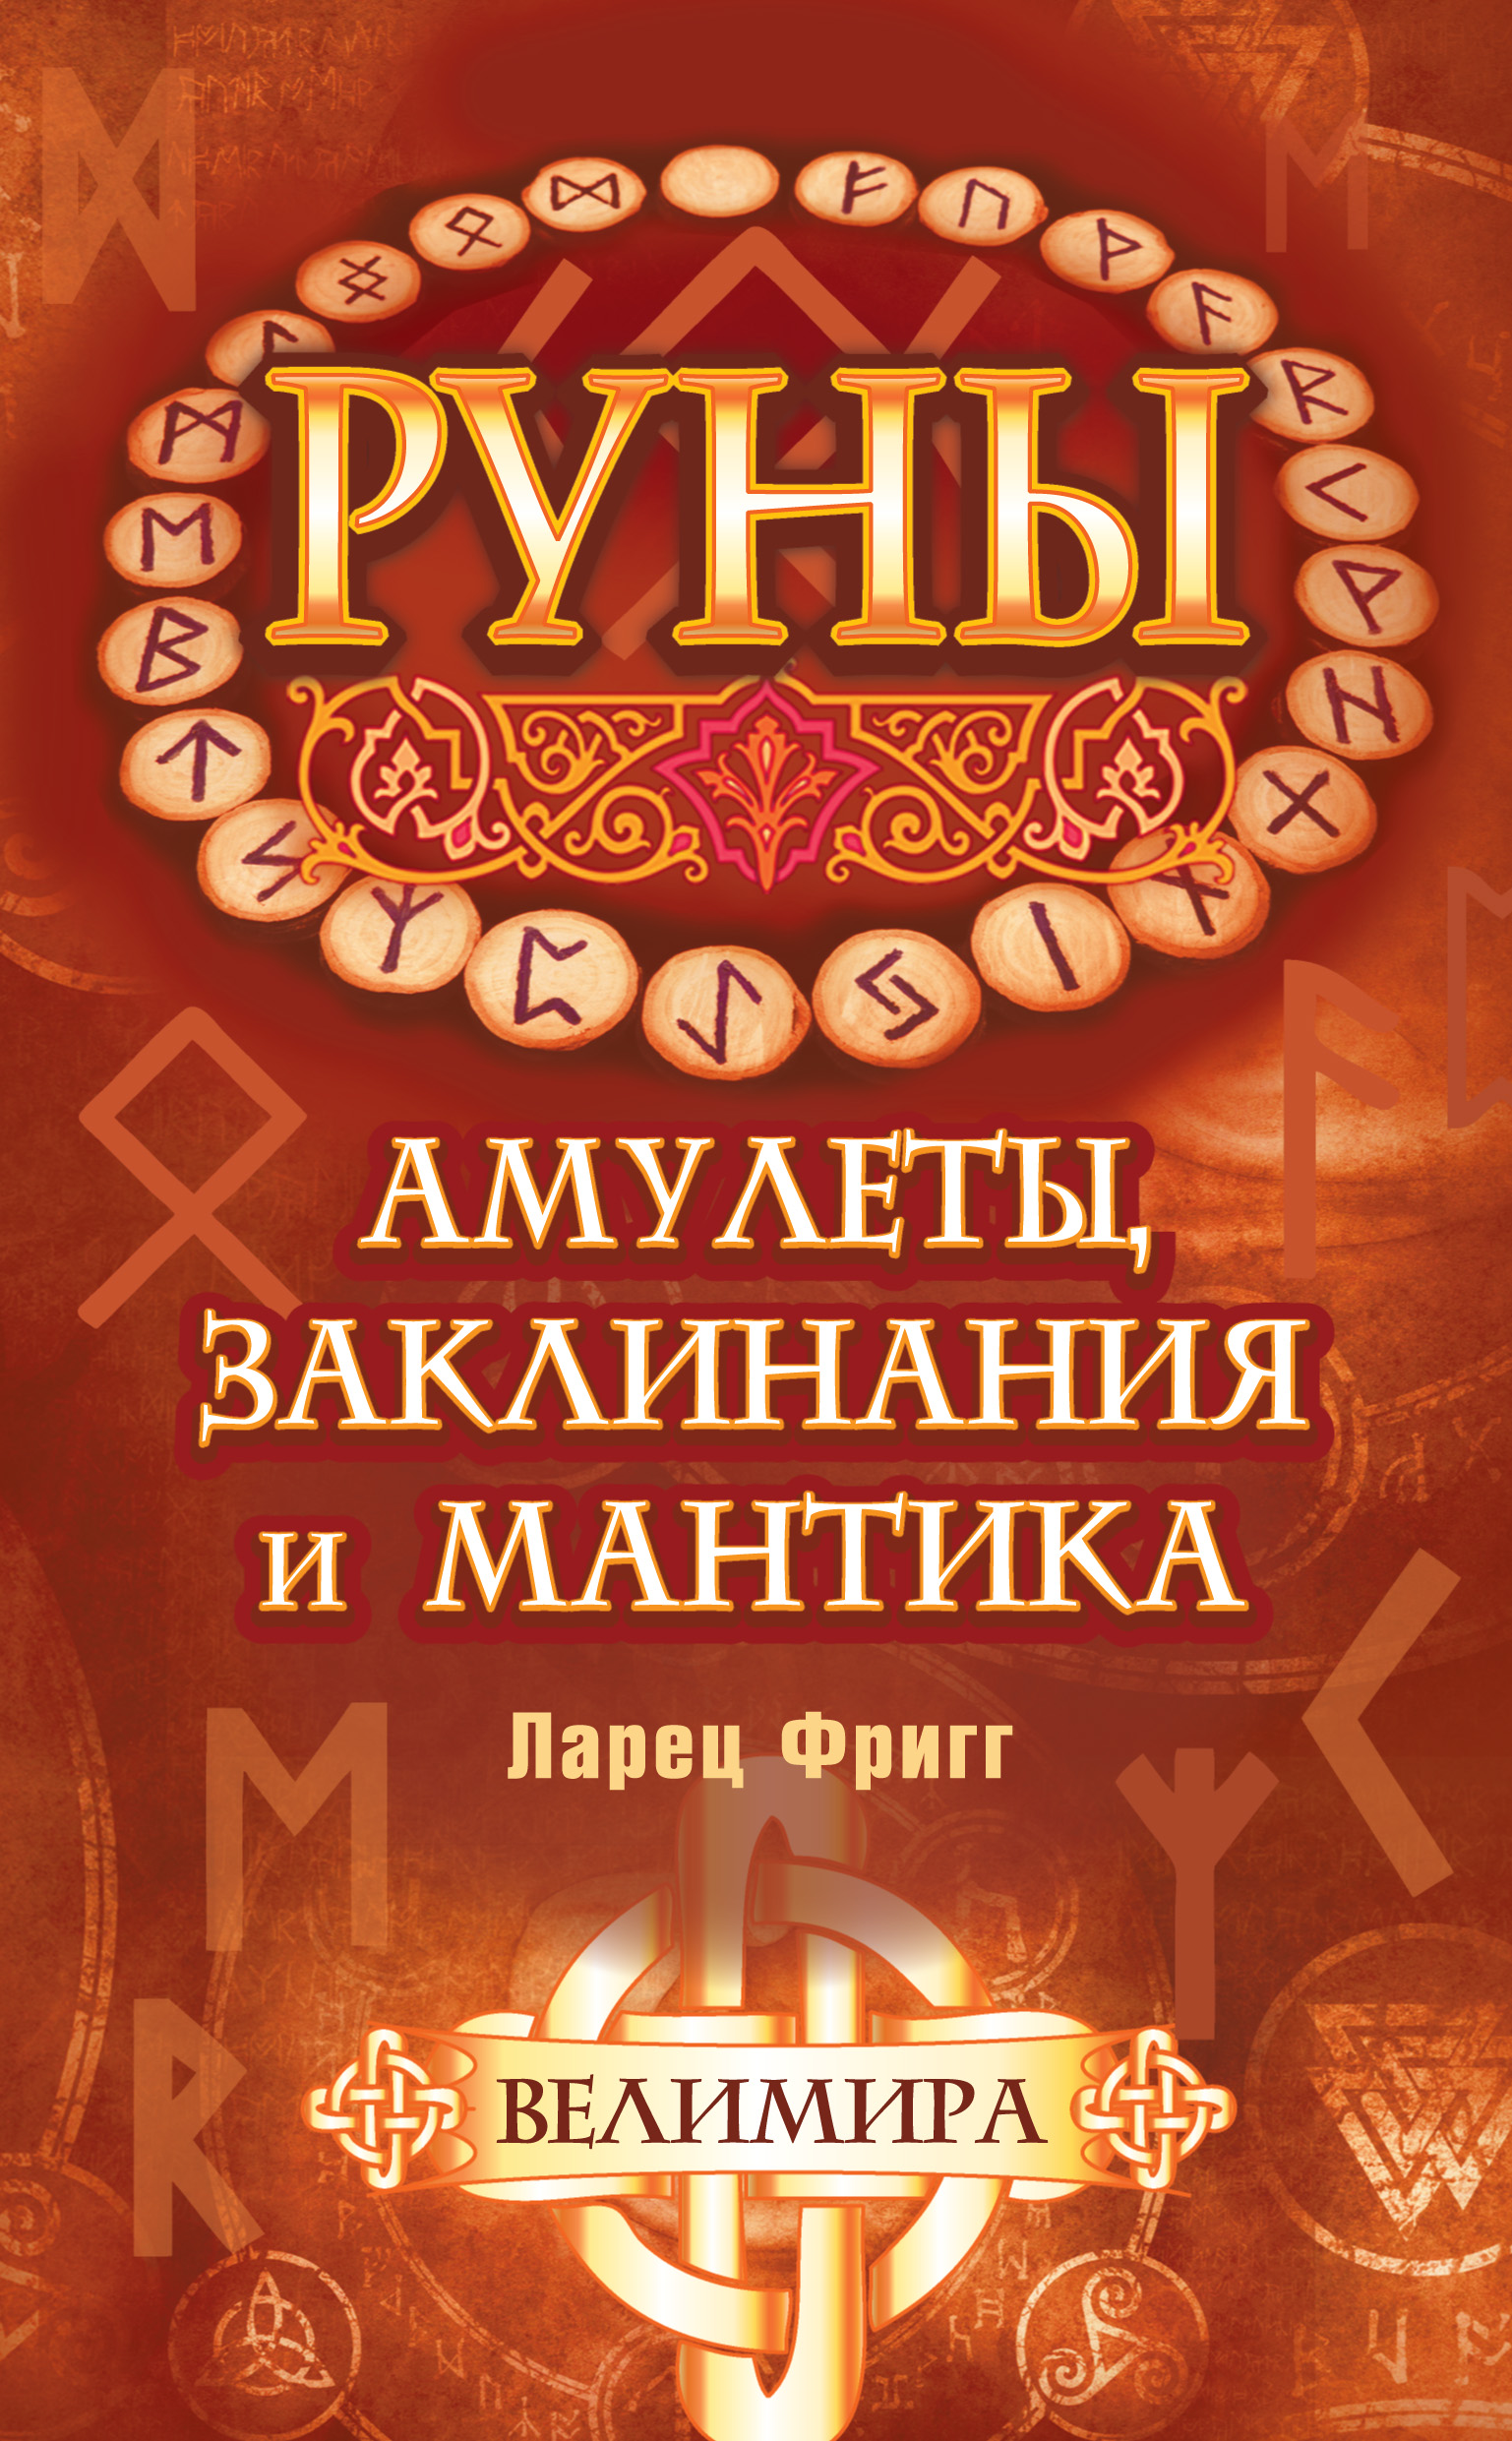 Велимира Руны: амулеты, заклинания и мантика. Ларец Фригг